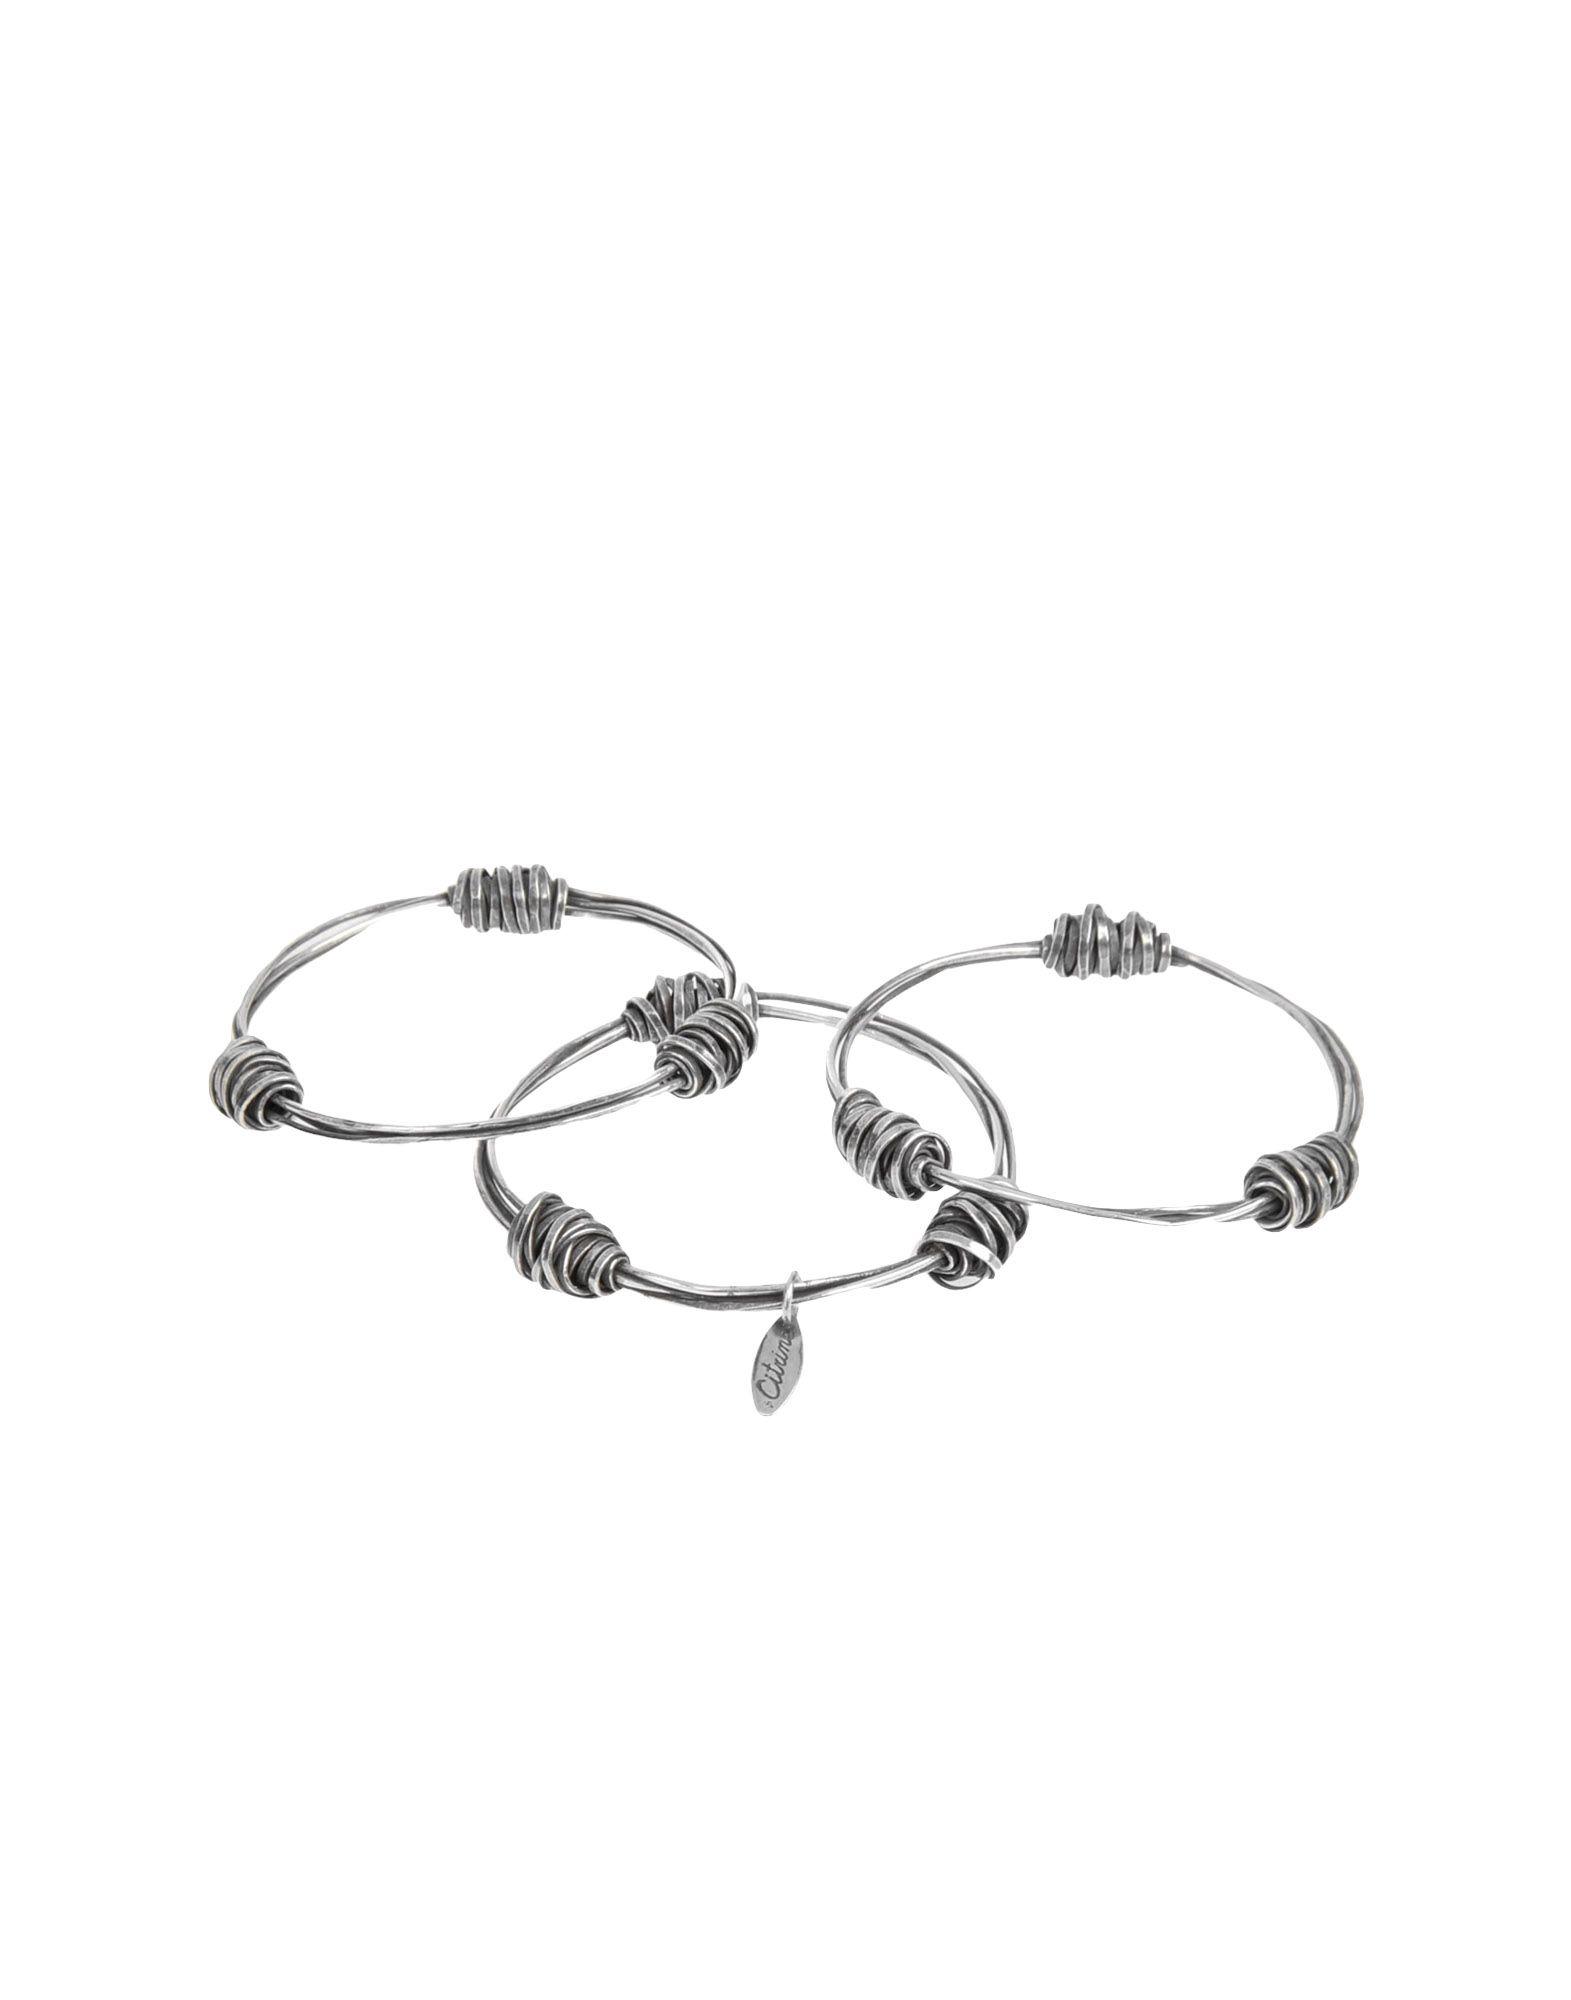 CITRINE BY THE STONES Bracelets